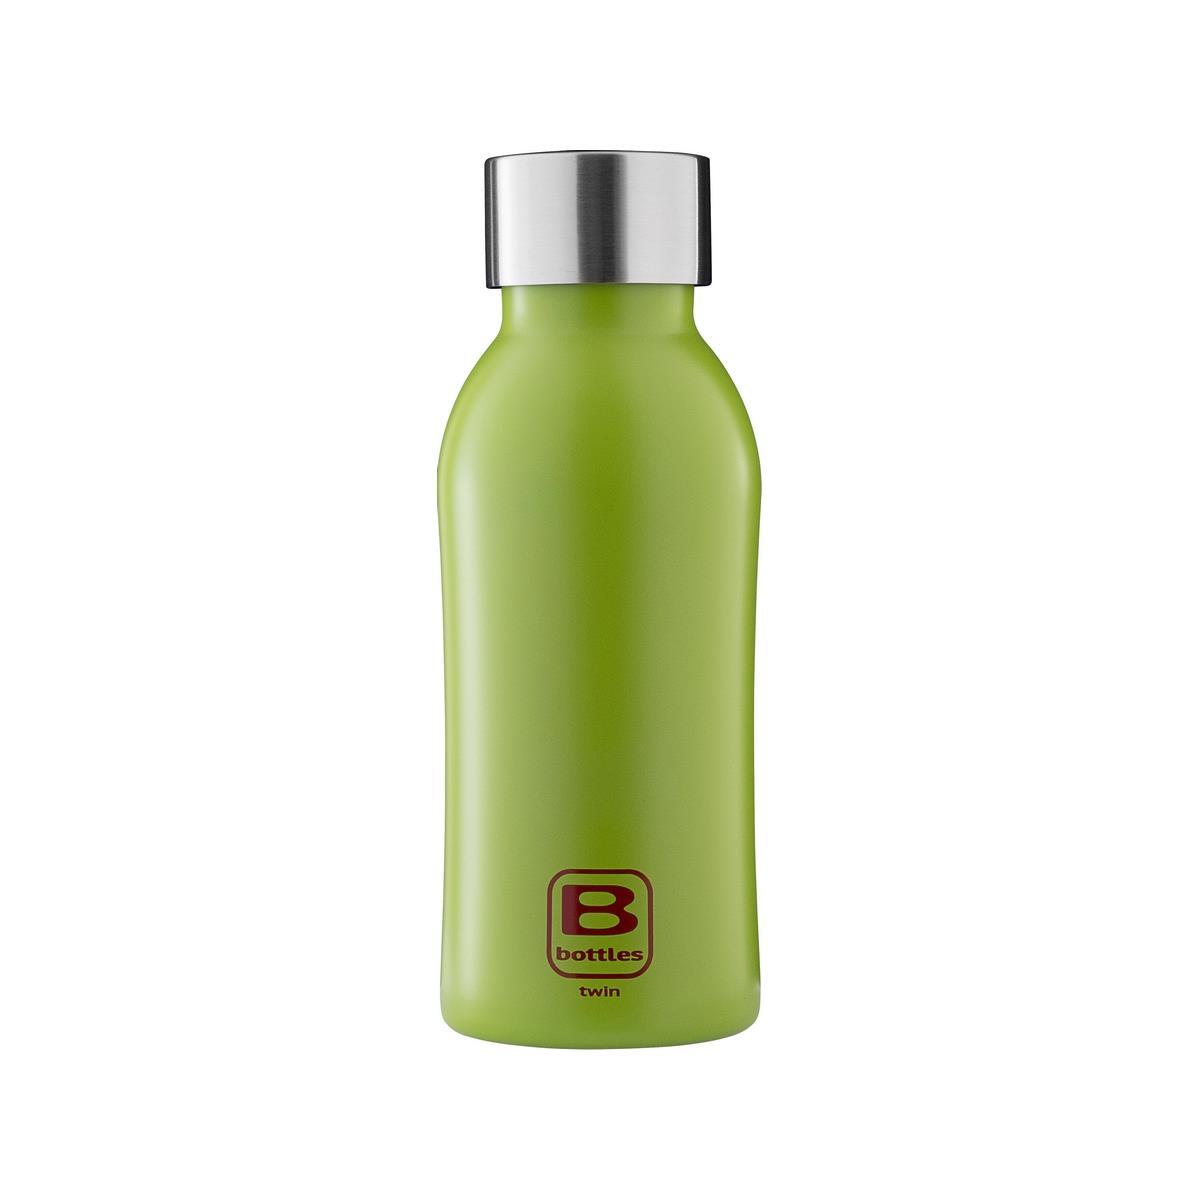 B Bottles Twin - Verde Lime - 350 ml - Bottiglia Termica a doppia parete in acciaio inox 18/10